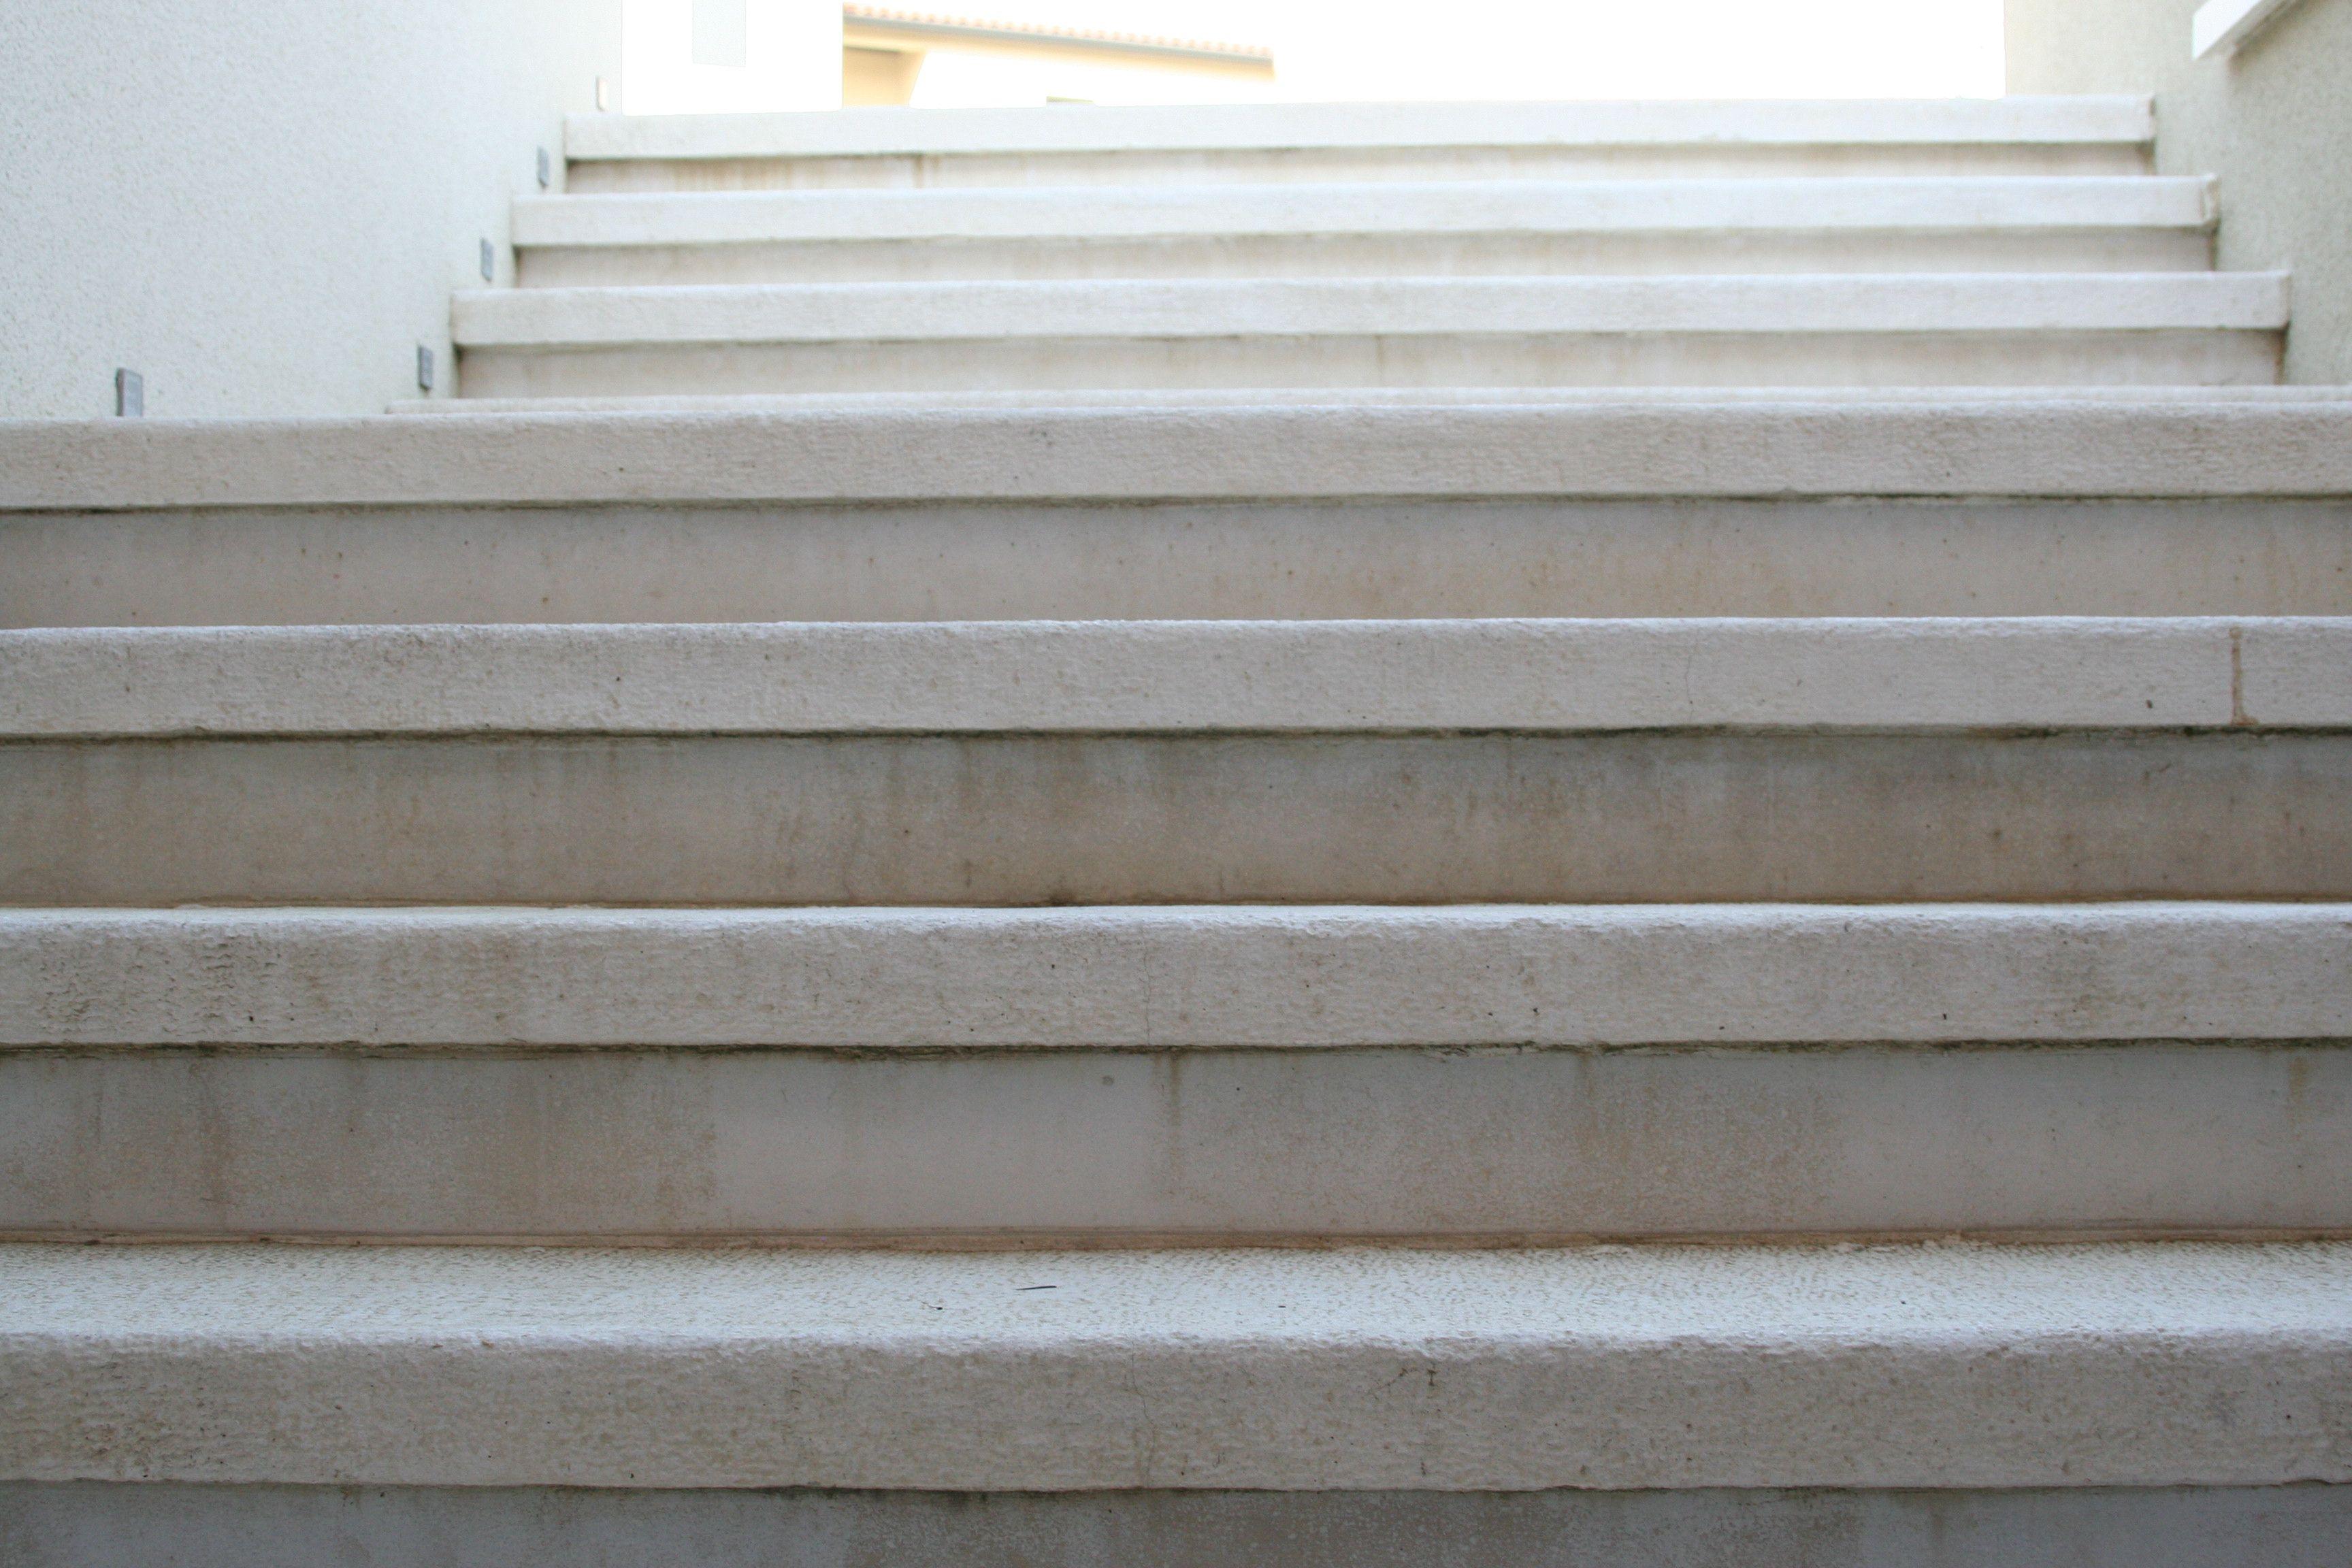 Marche Escalier Plate Aspect Grenaille Antiderapant En Beton